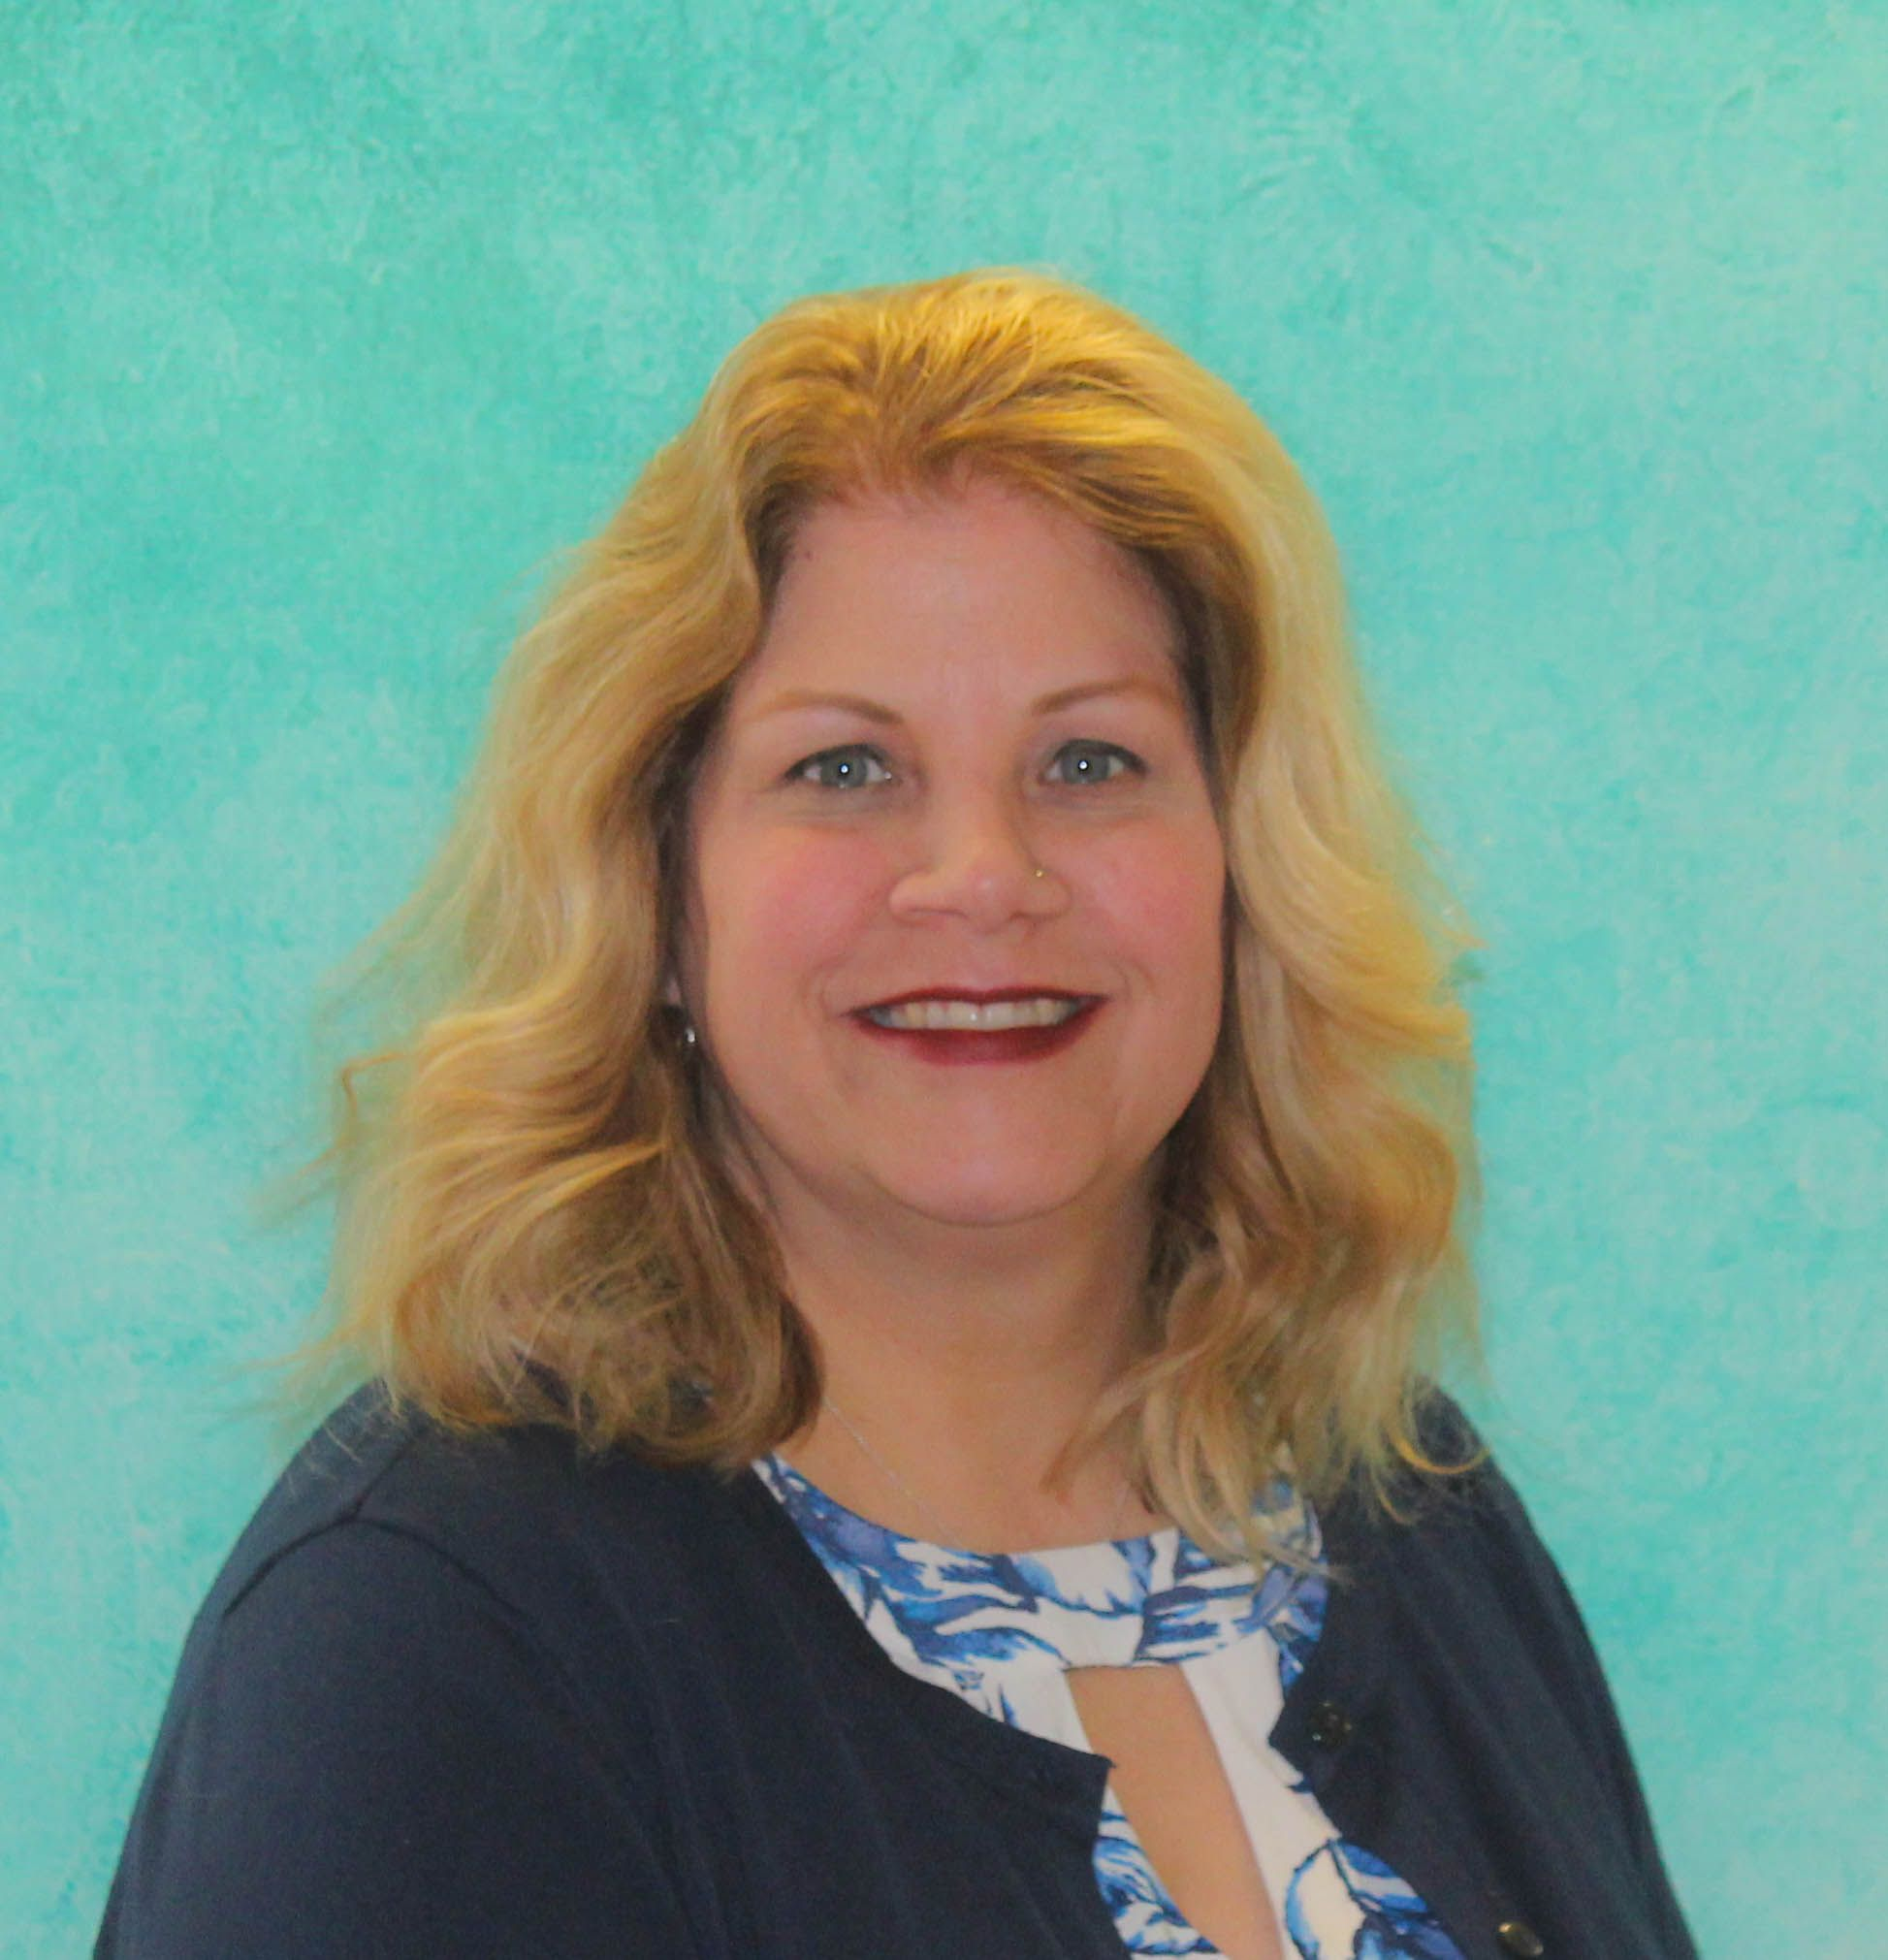 Sarah Brown, Program Director